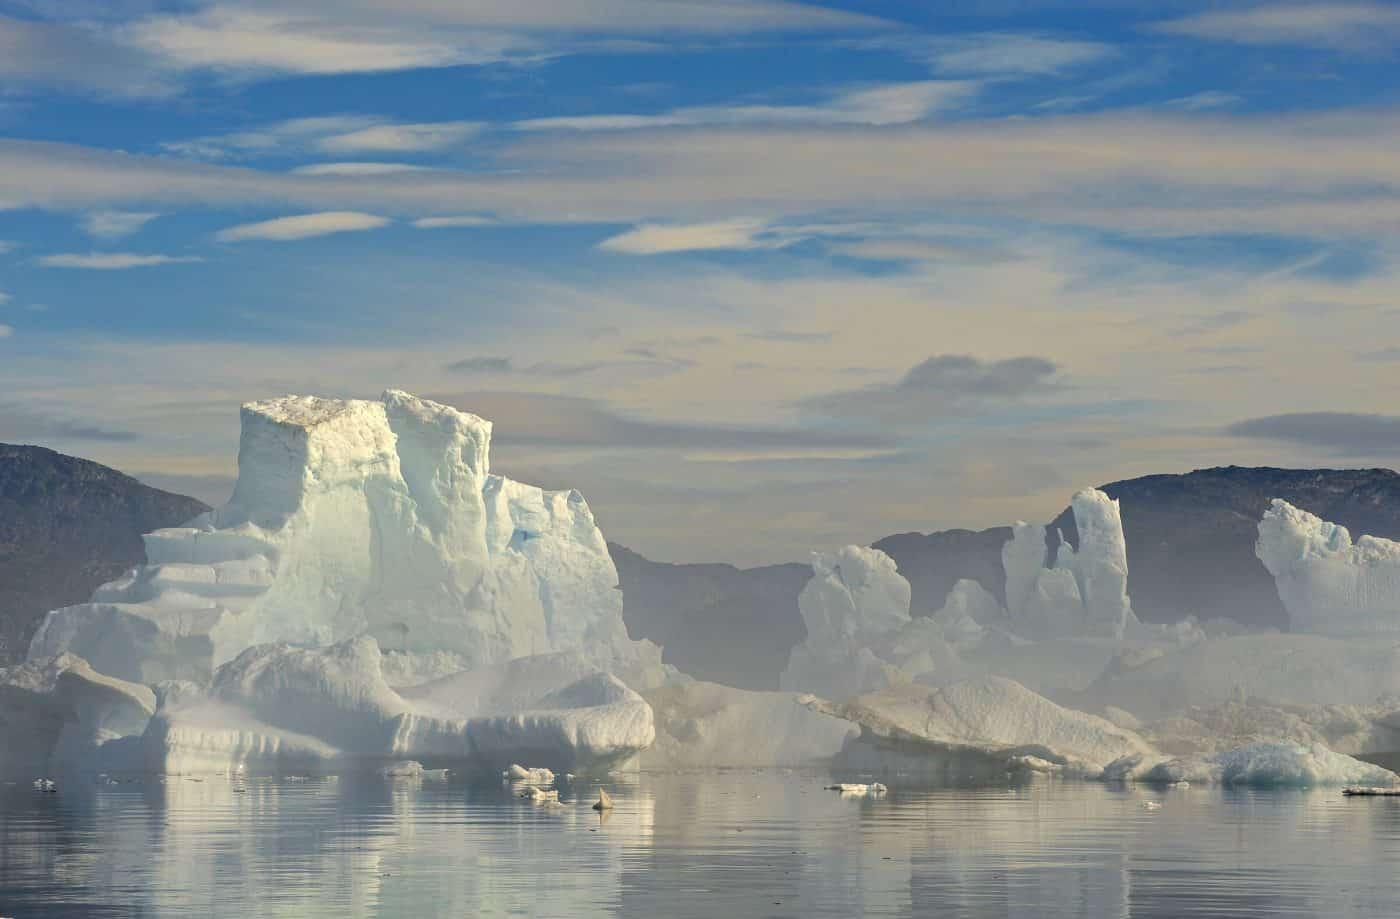 Icebergs in the mist in the Disko Bay, Greenland, by David Buchmann